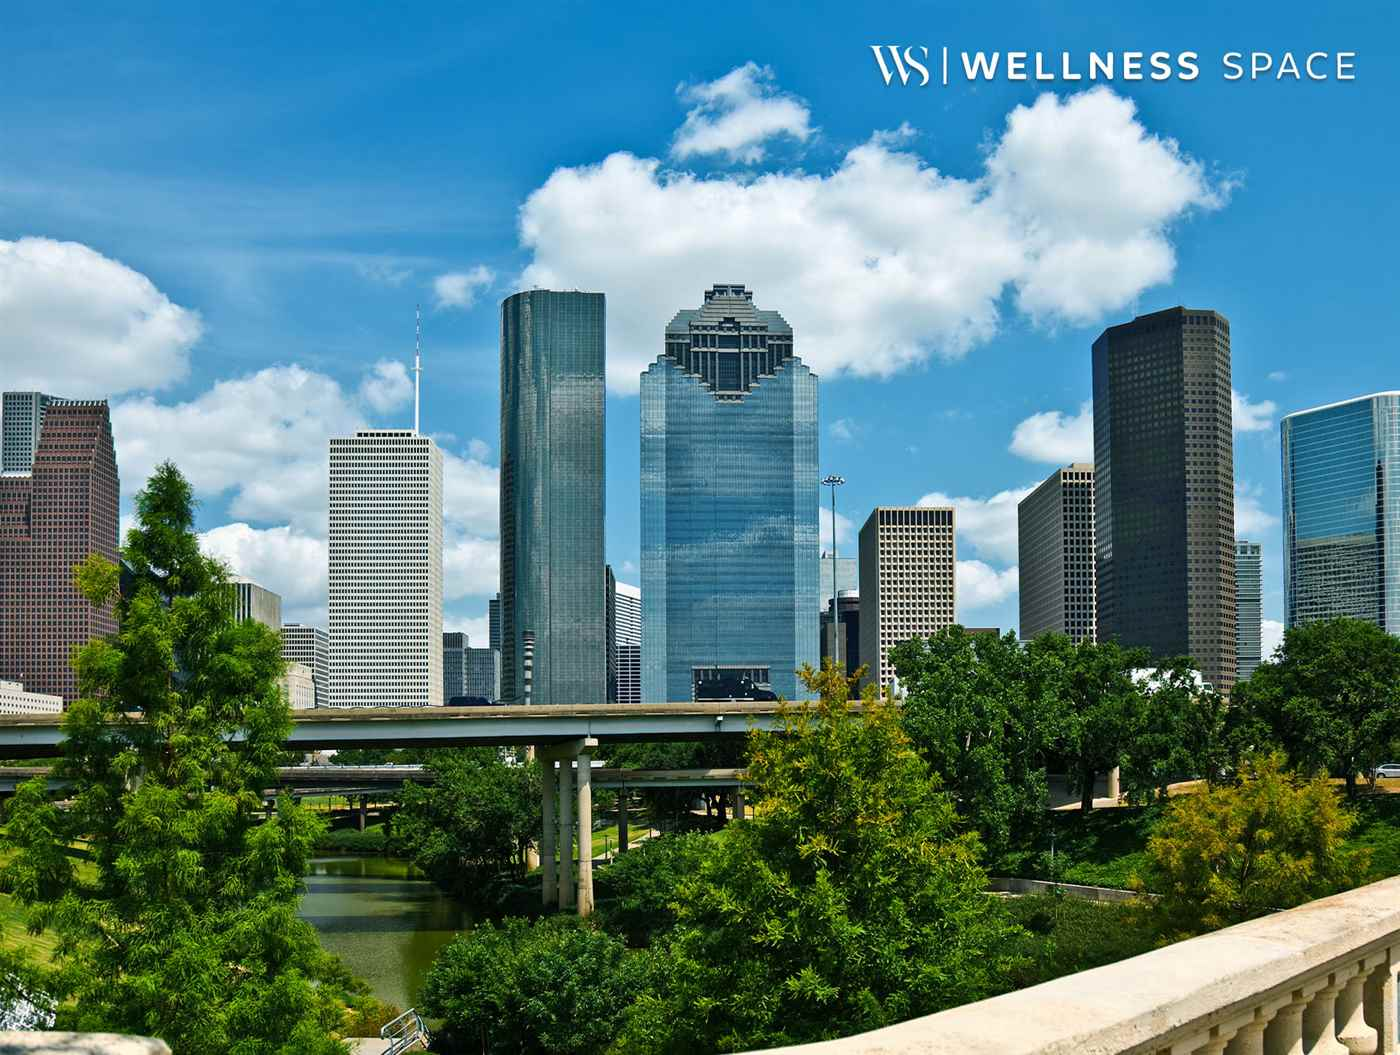 WellnessSpace